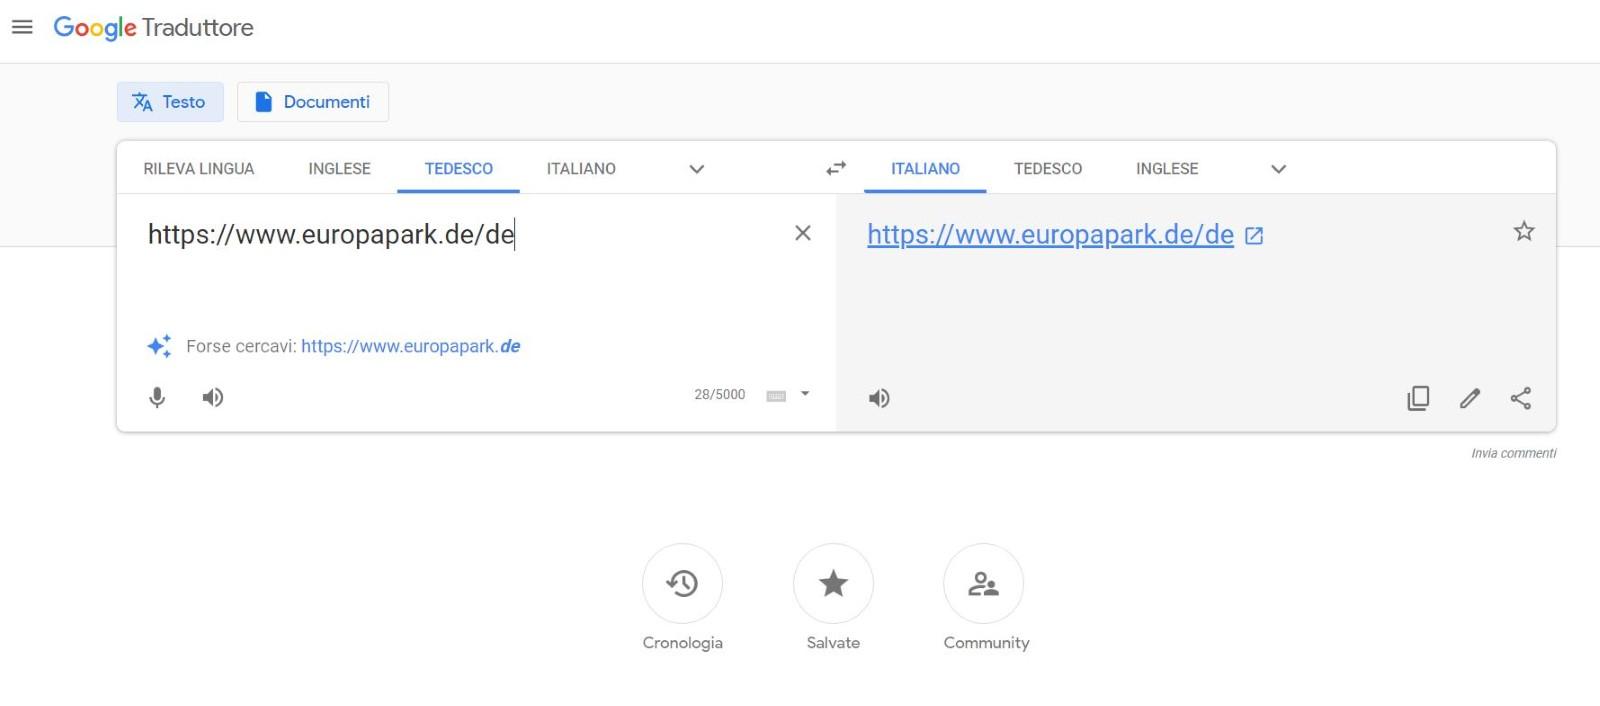 link google traduttore